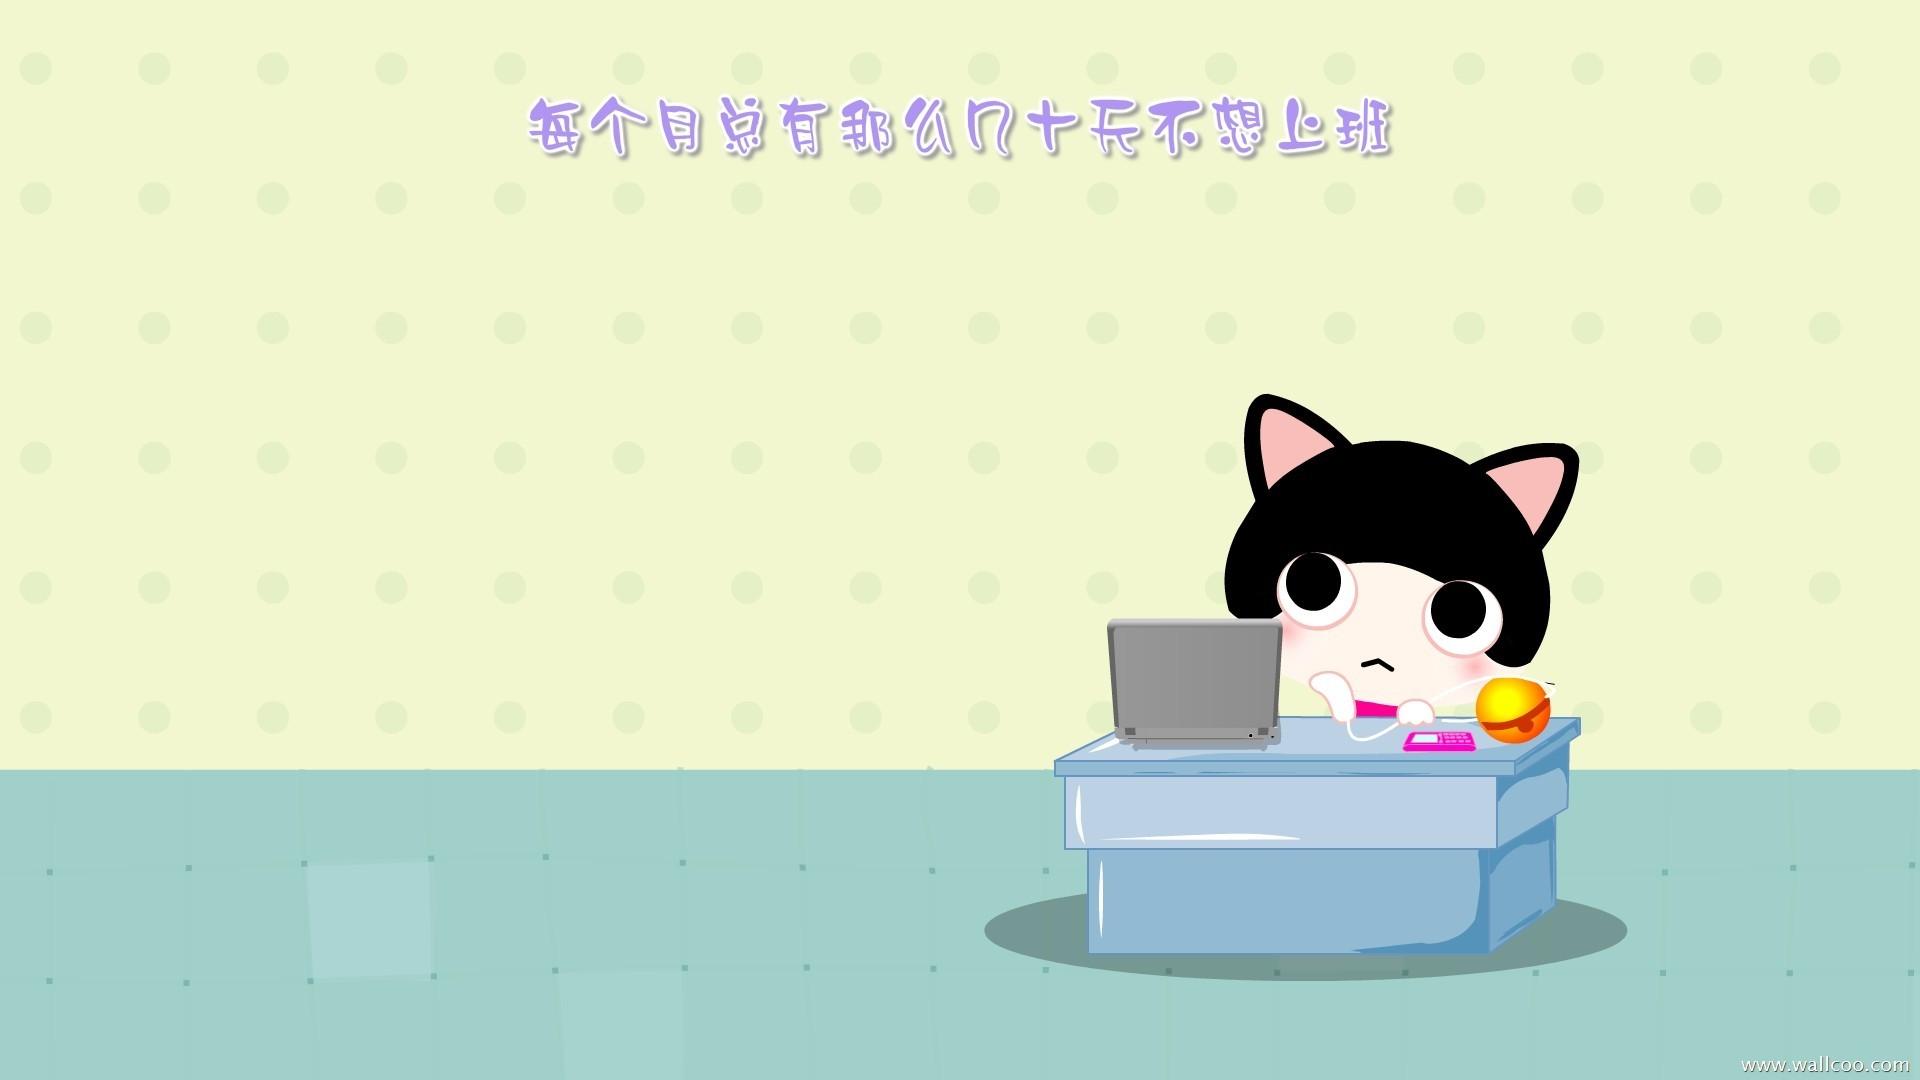 Cute Cartoon Cat Wallpaper : Cool Background HD